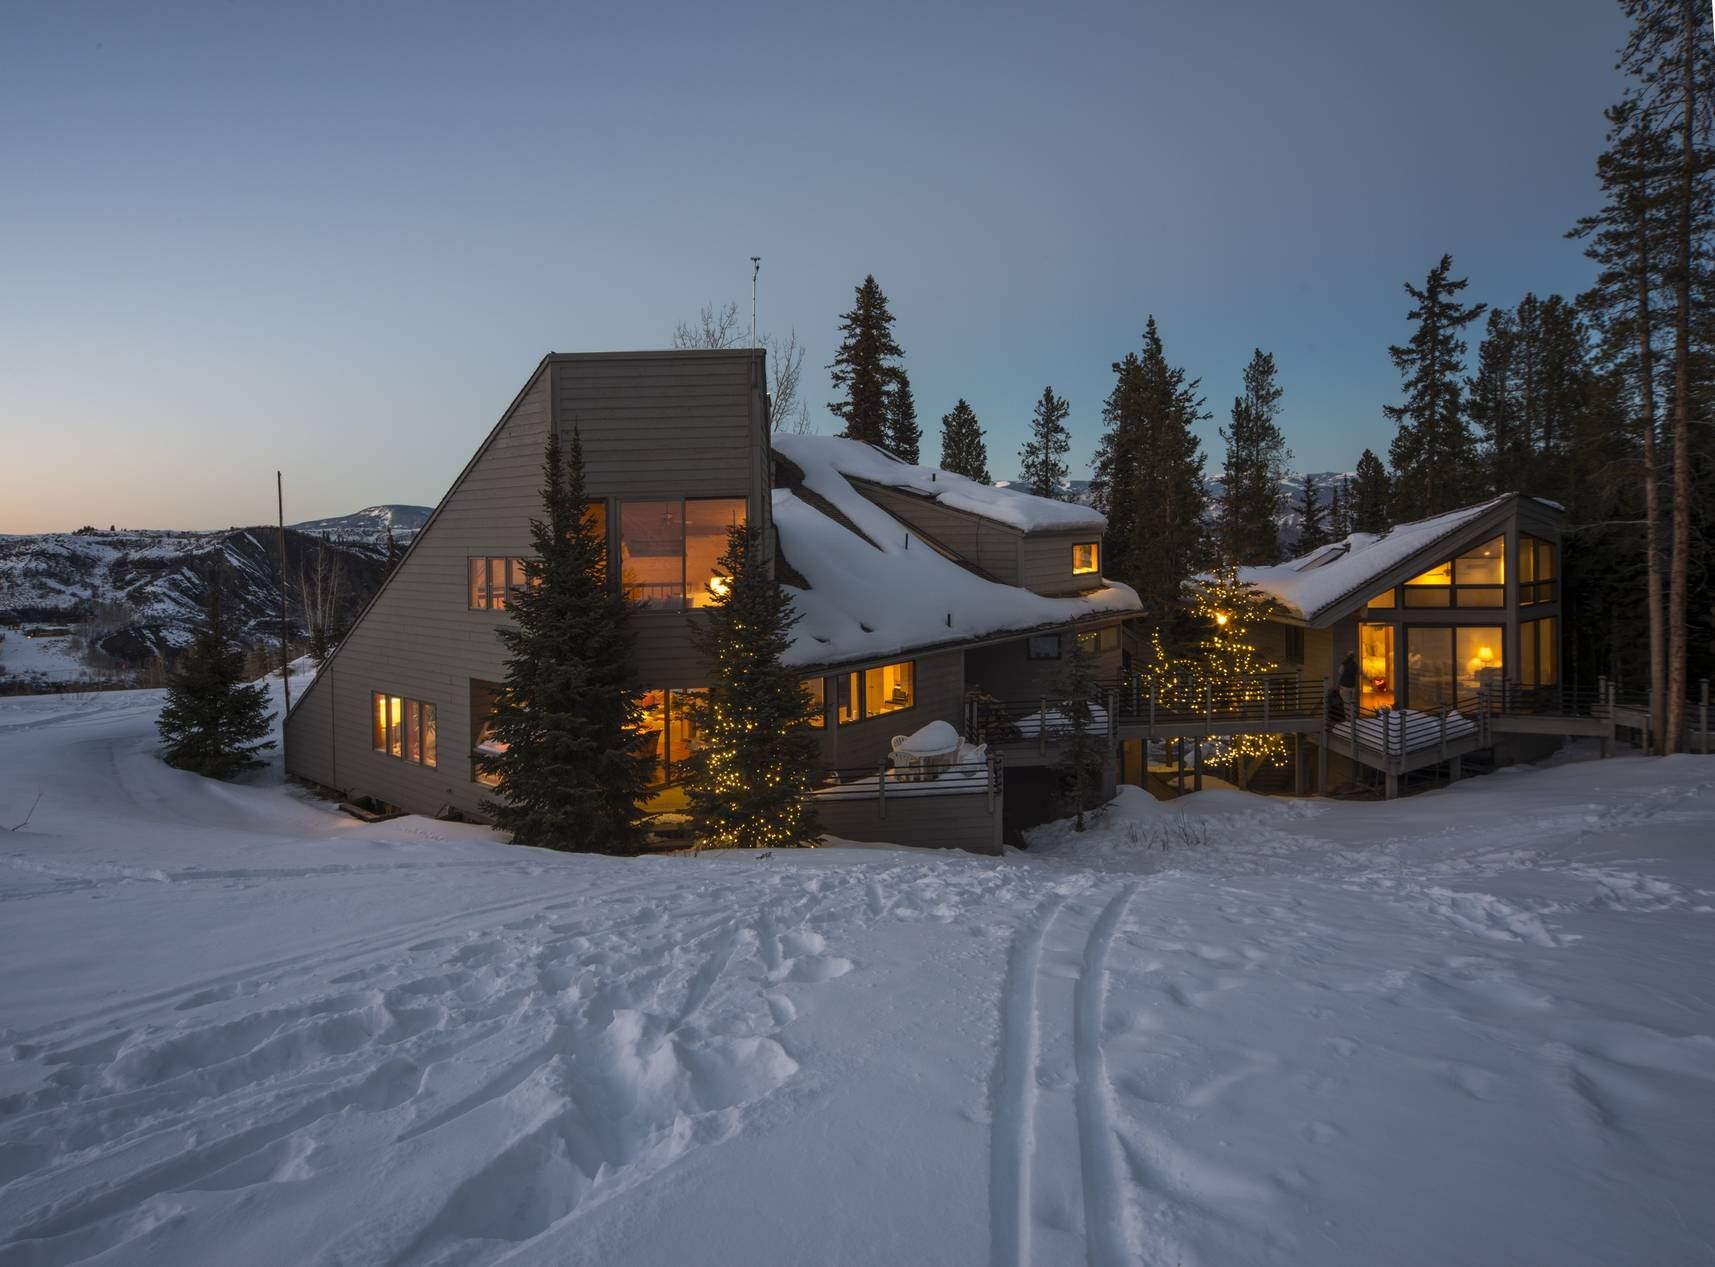 85 Pine Lane Snowmass Village Photo 1